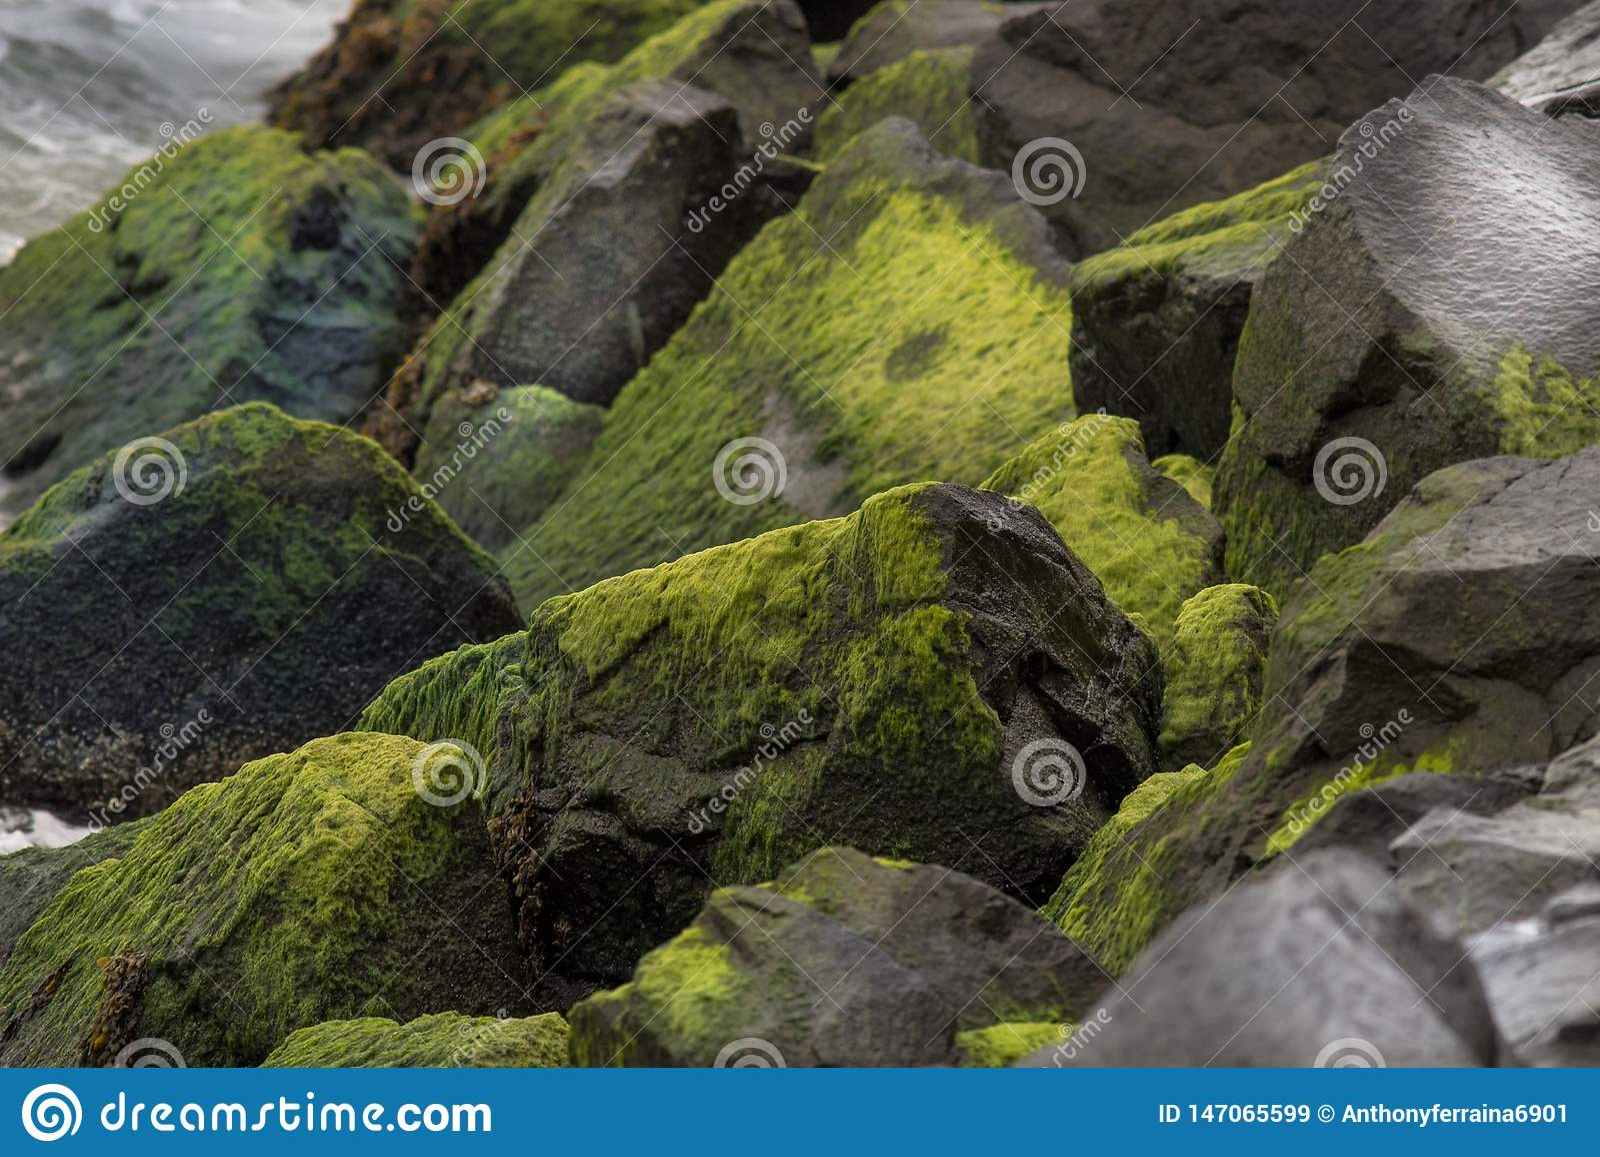 Moss And Algae Chondrus Crispus Stock Image Image Of Slime